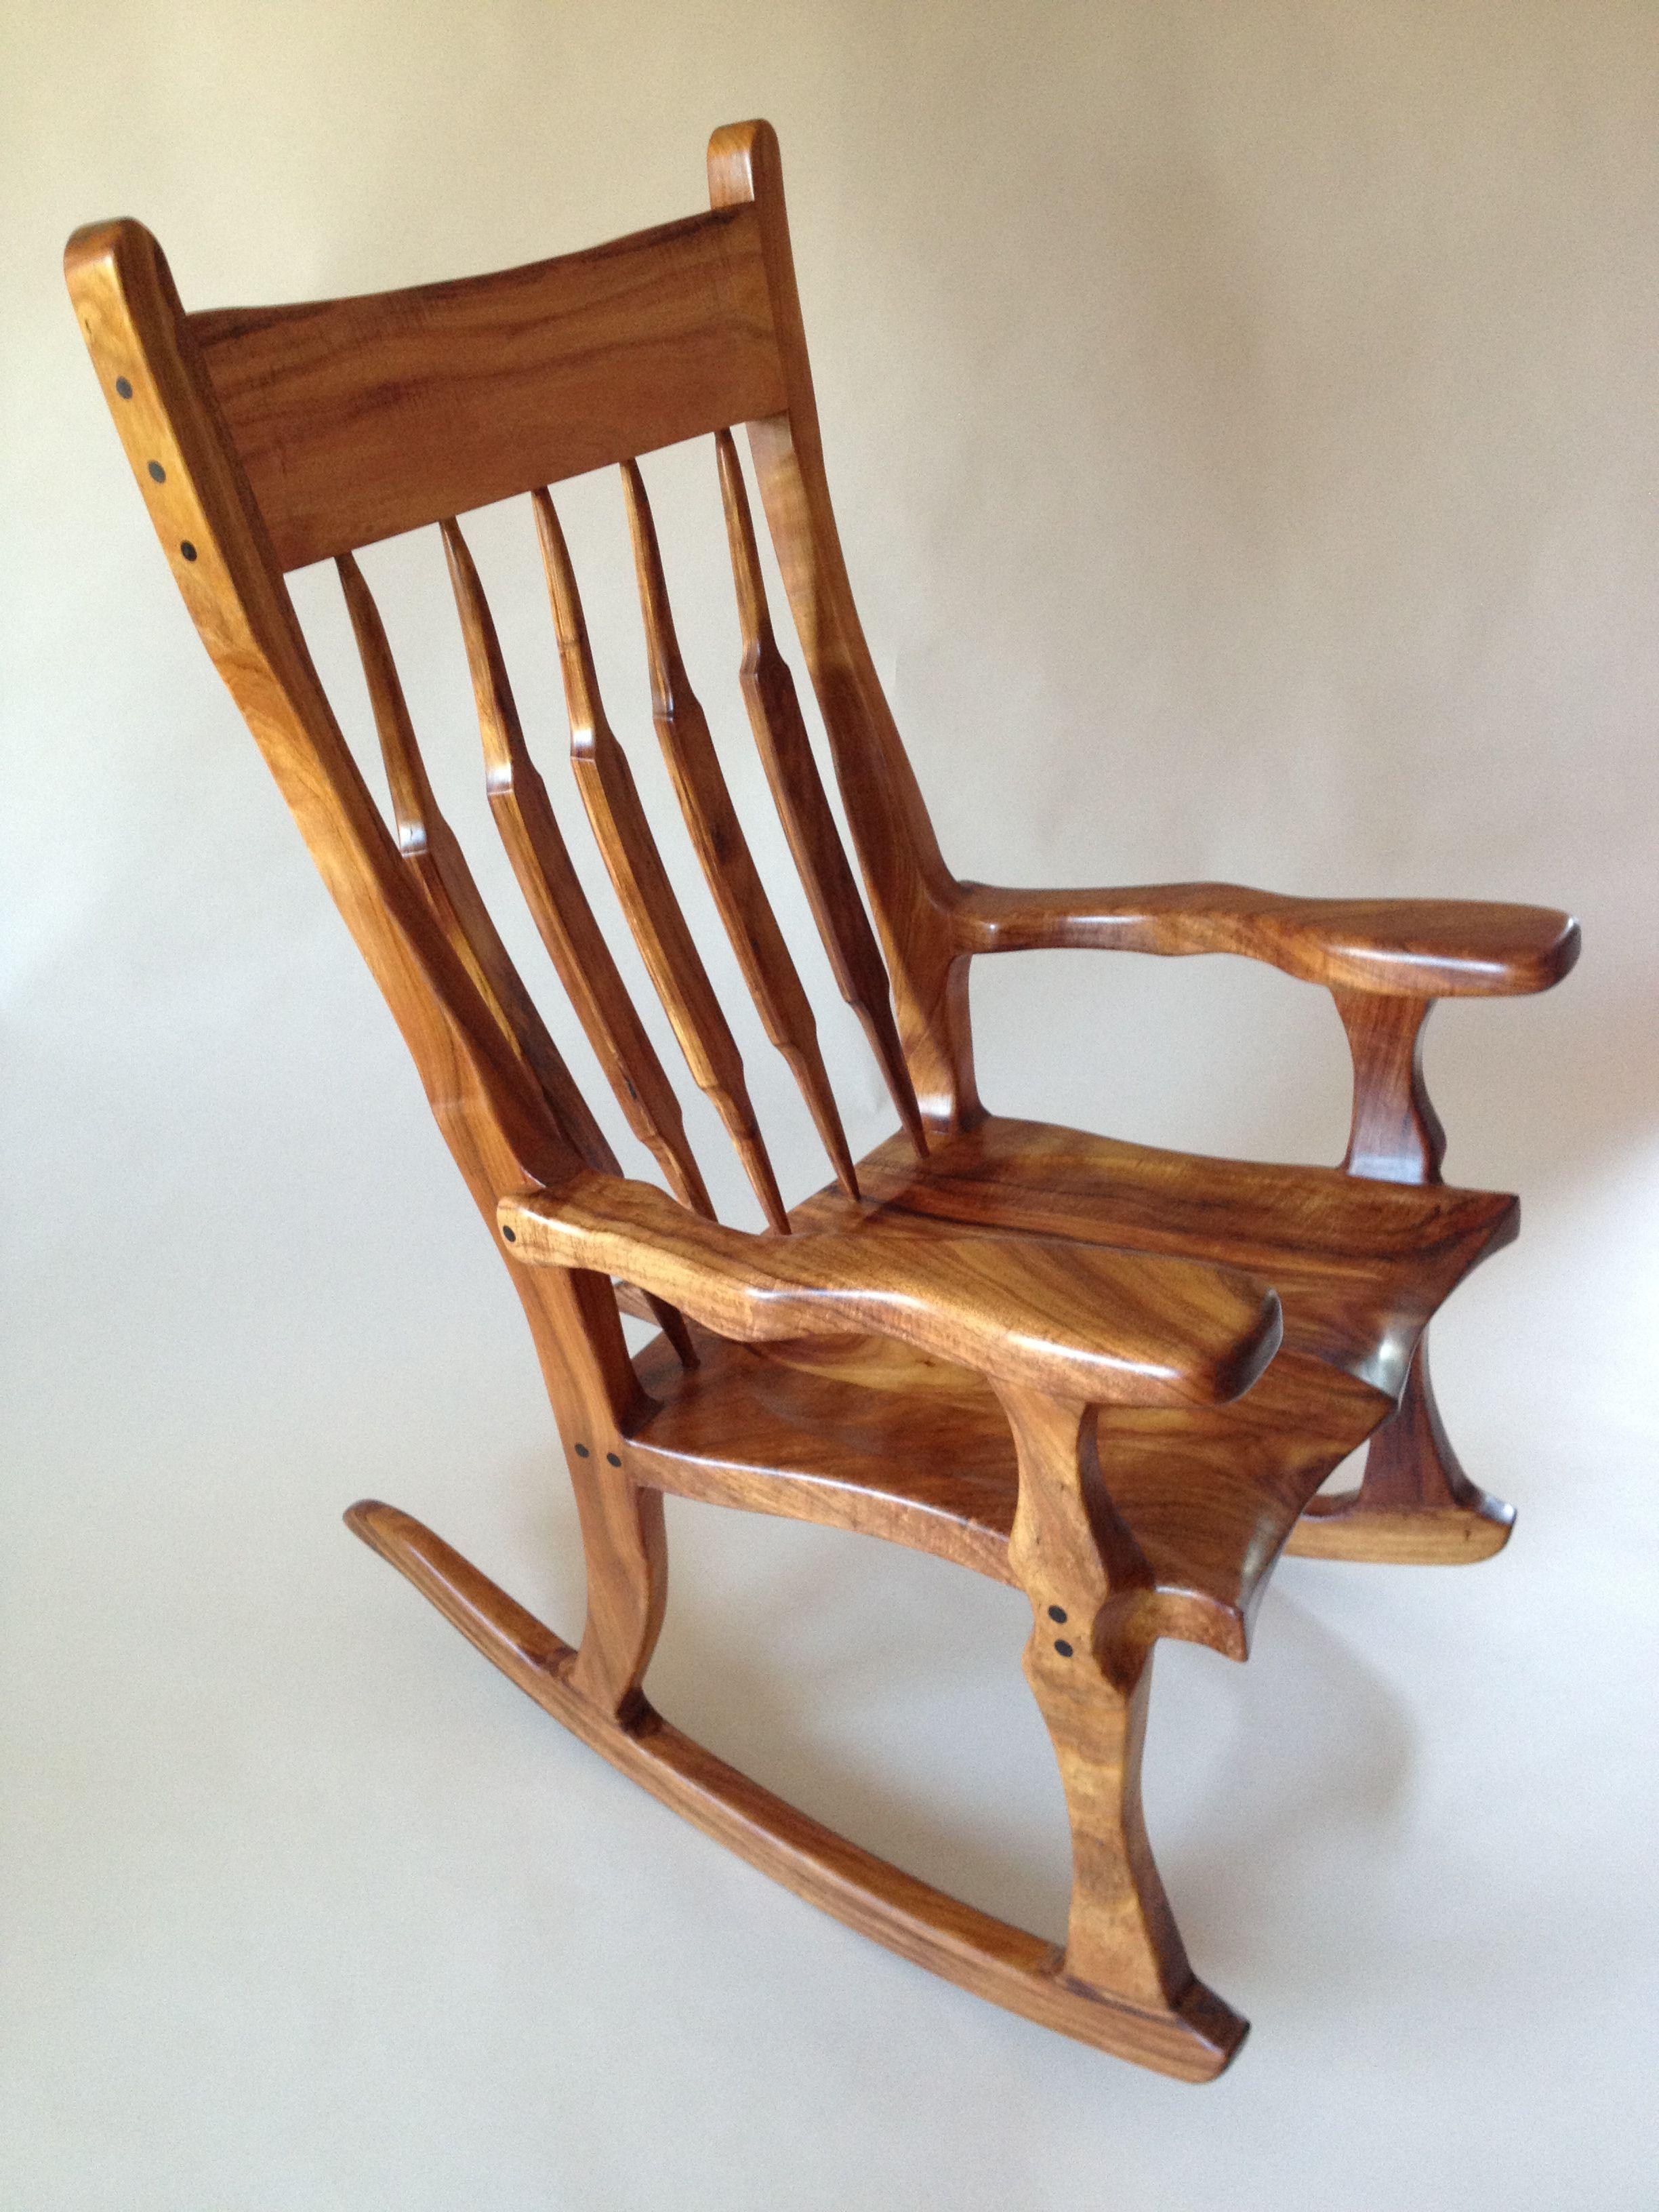 Tremendous Hawaiian Koa Wood Rocking Chair 6 000 Chairs Rocking Machost Co Dining Chair Design Ideas Machostcouk